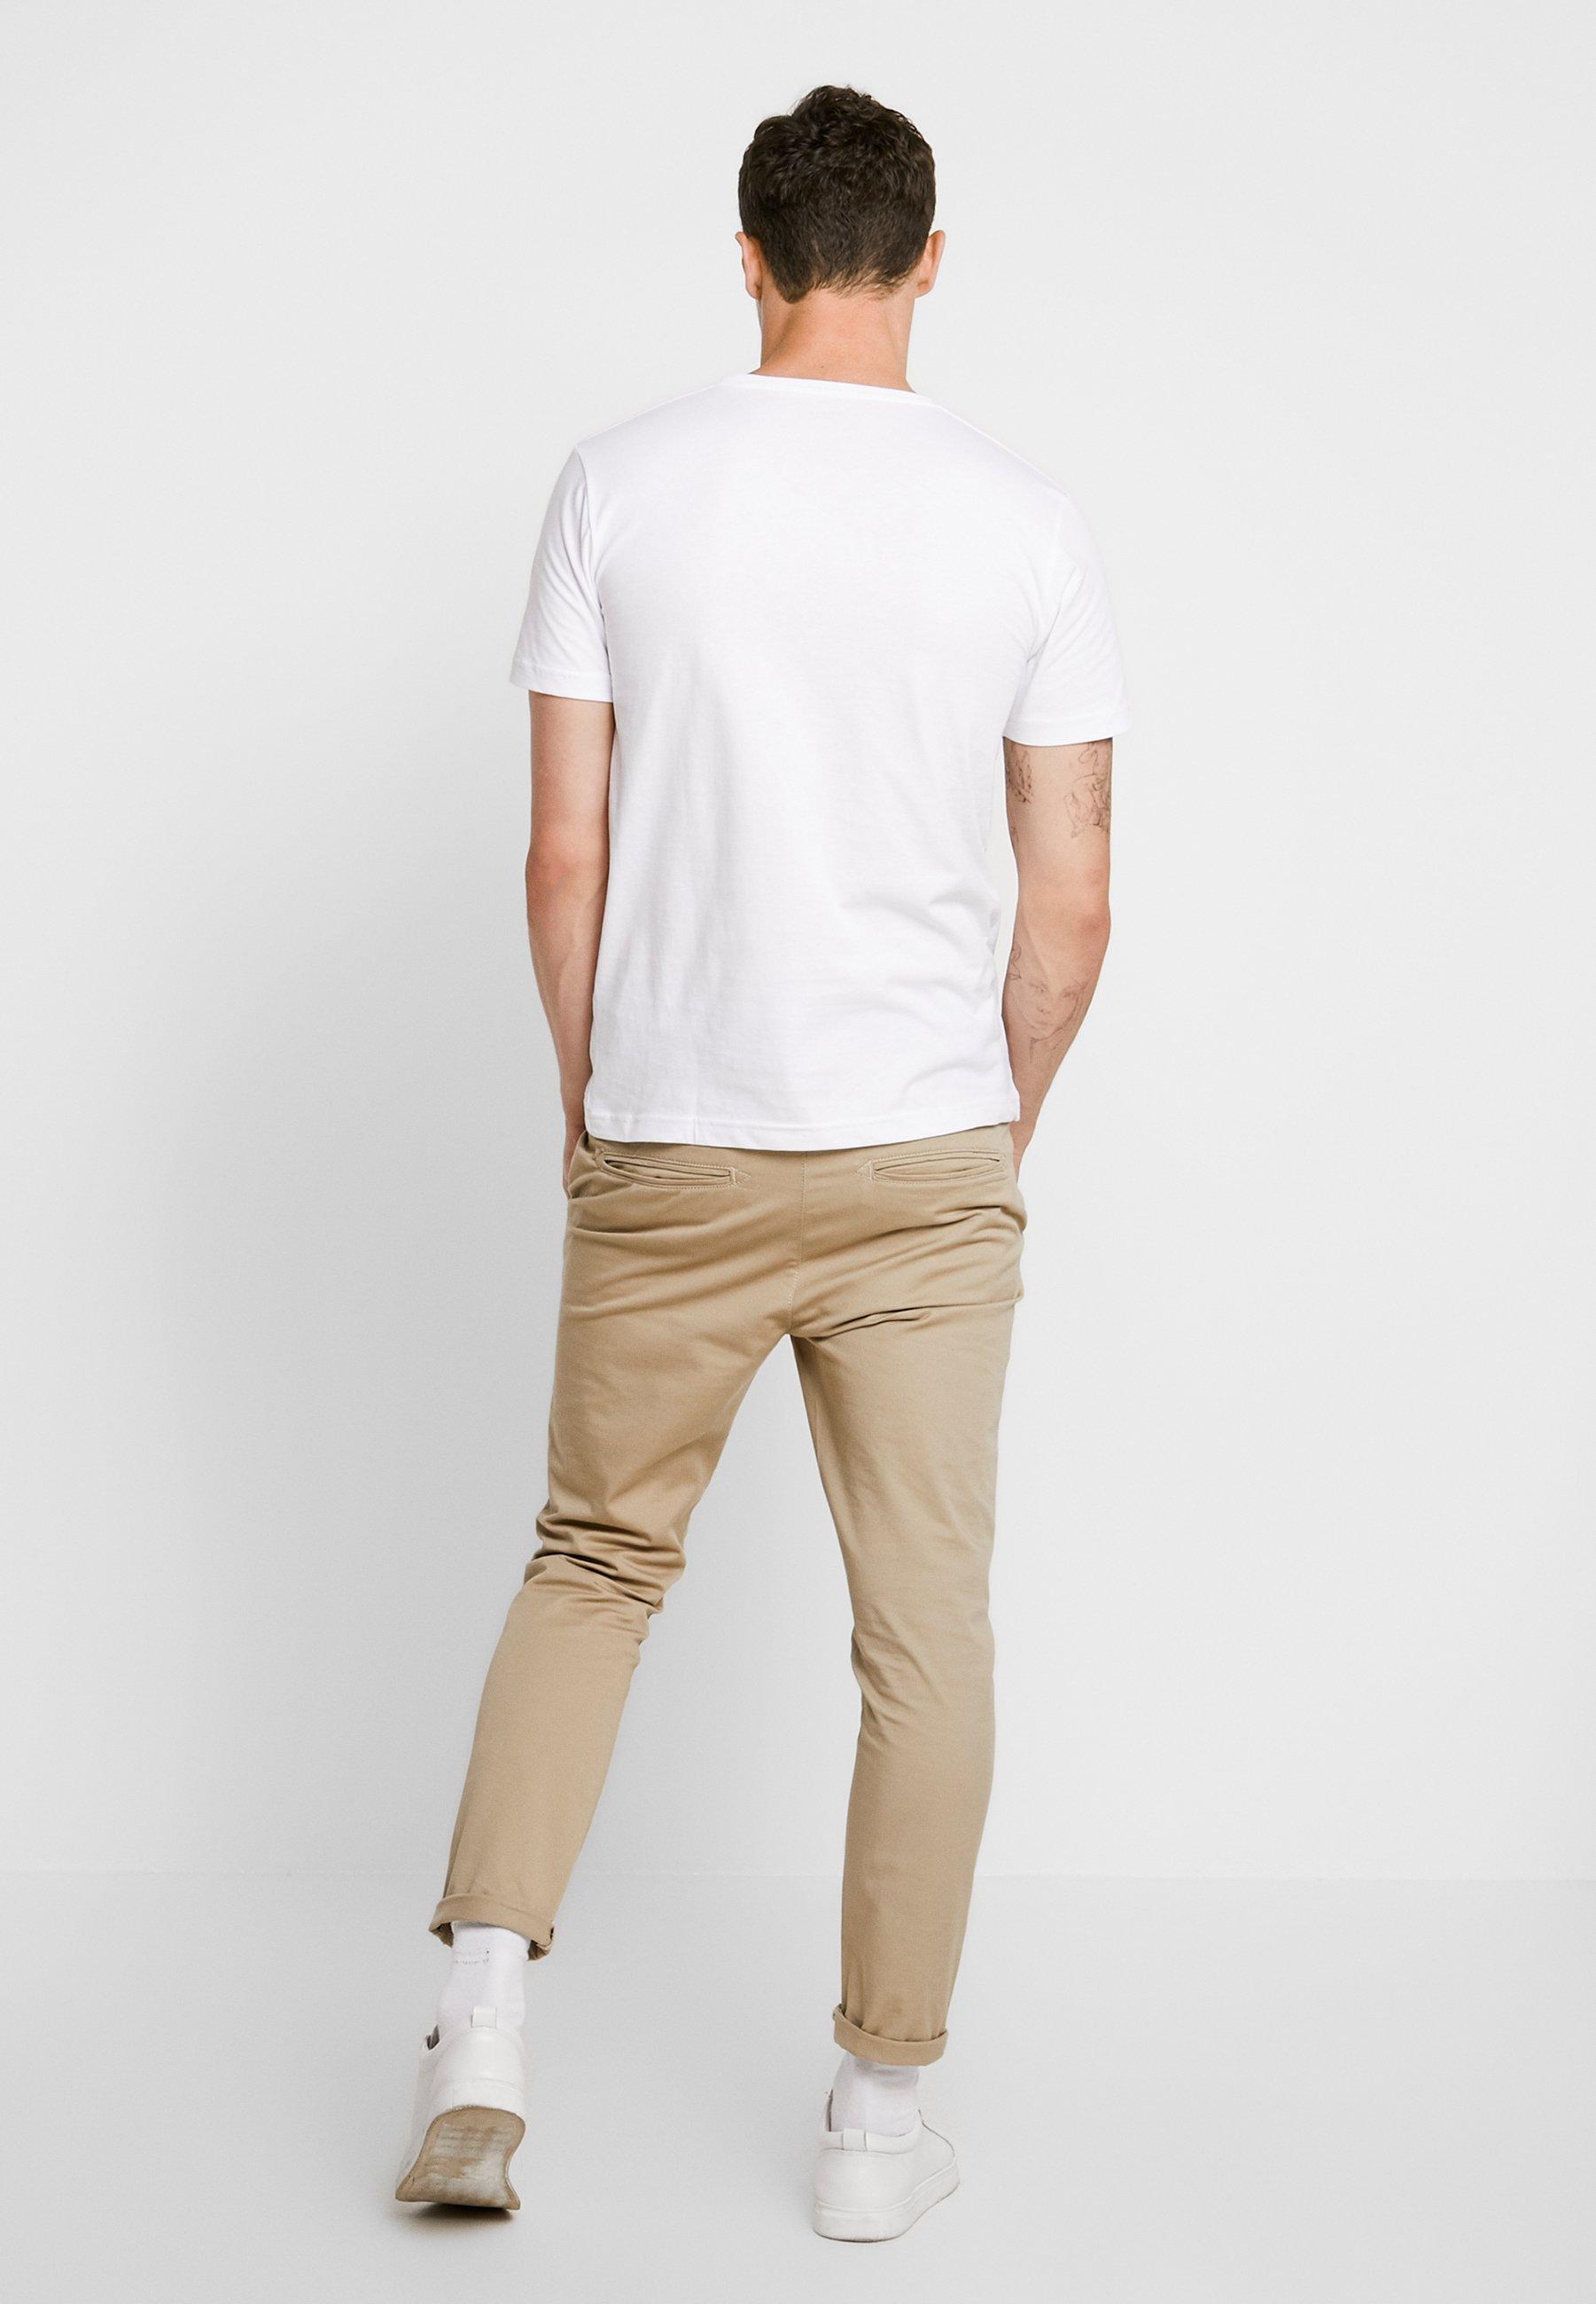 shirt White Makia Imprimé Makia Imprimé White BrandT shirt BrandT uTlFJ31Kc